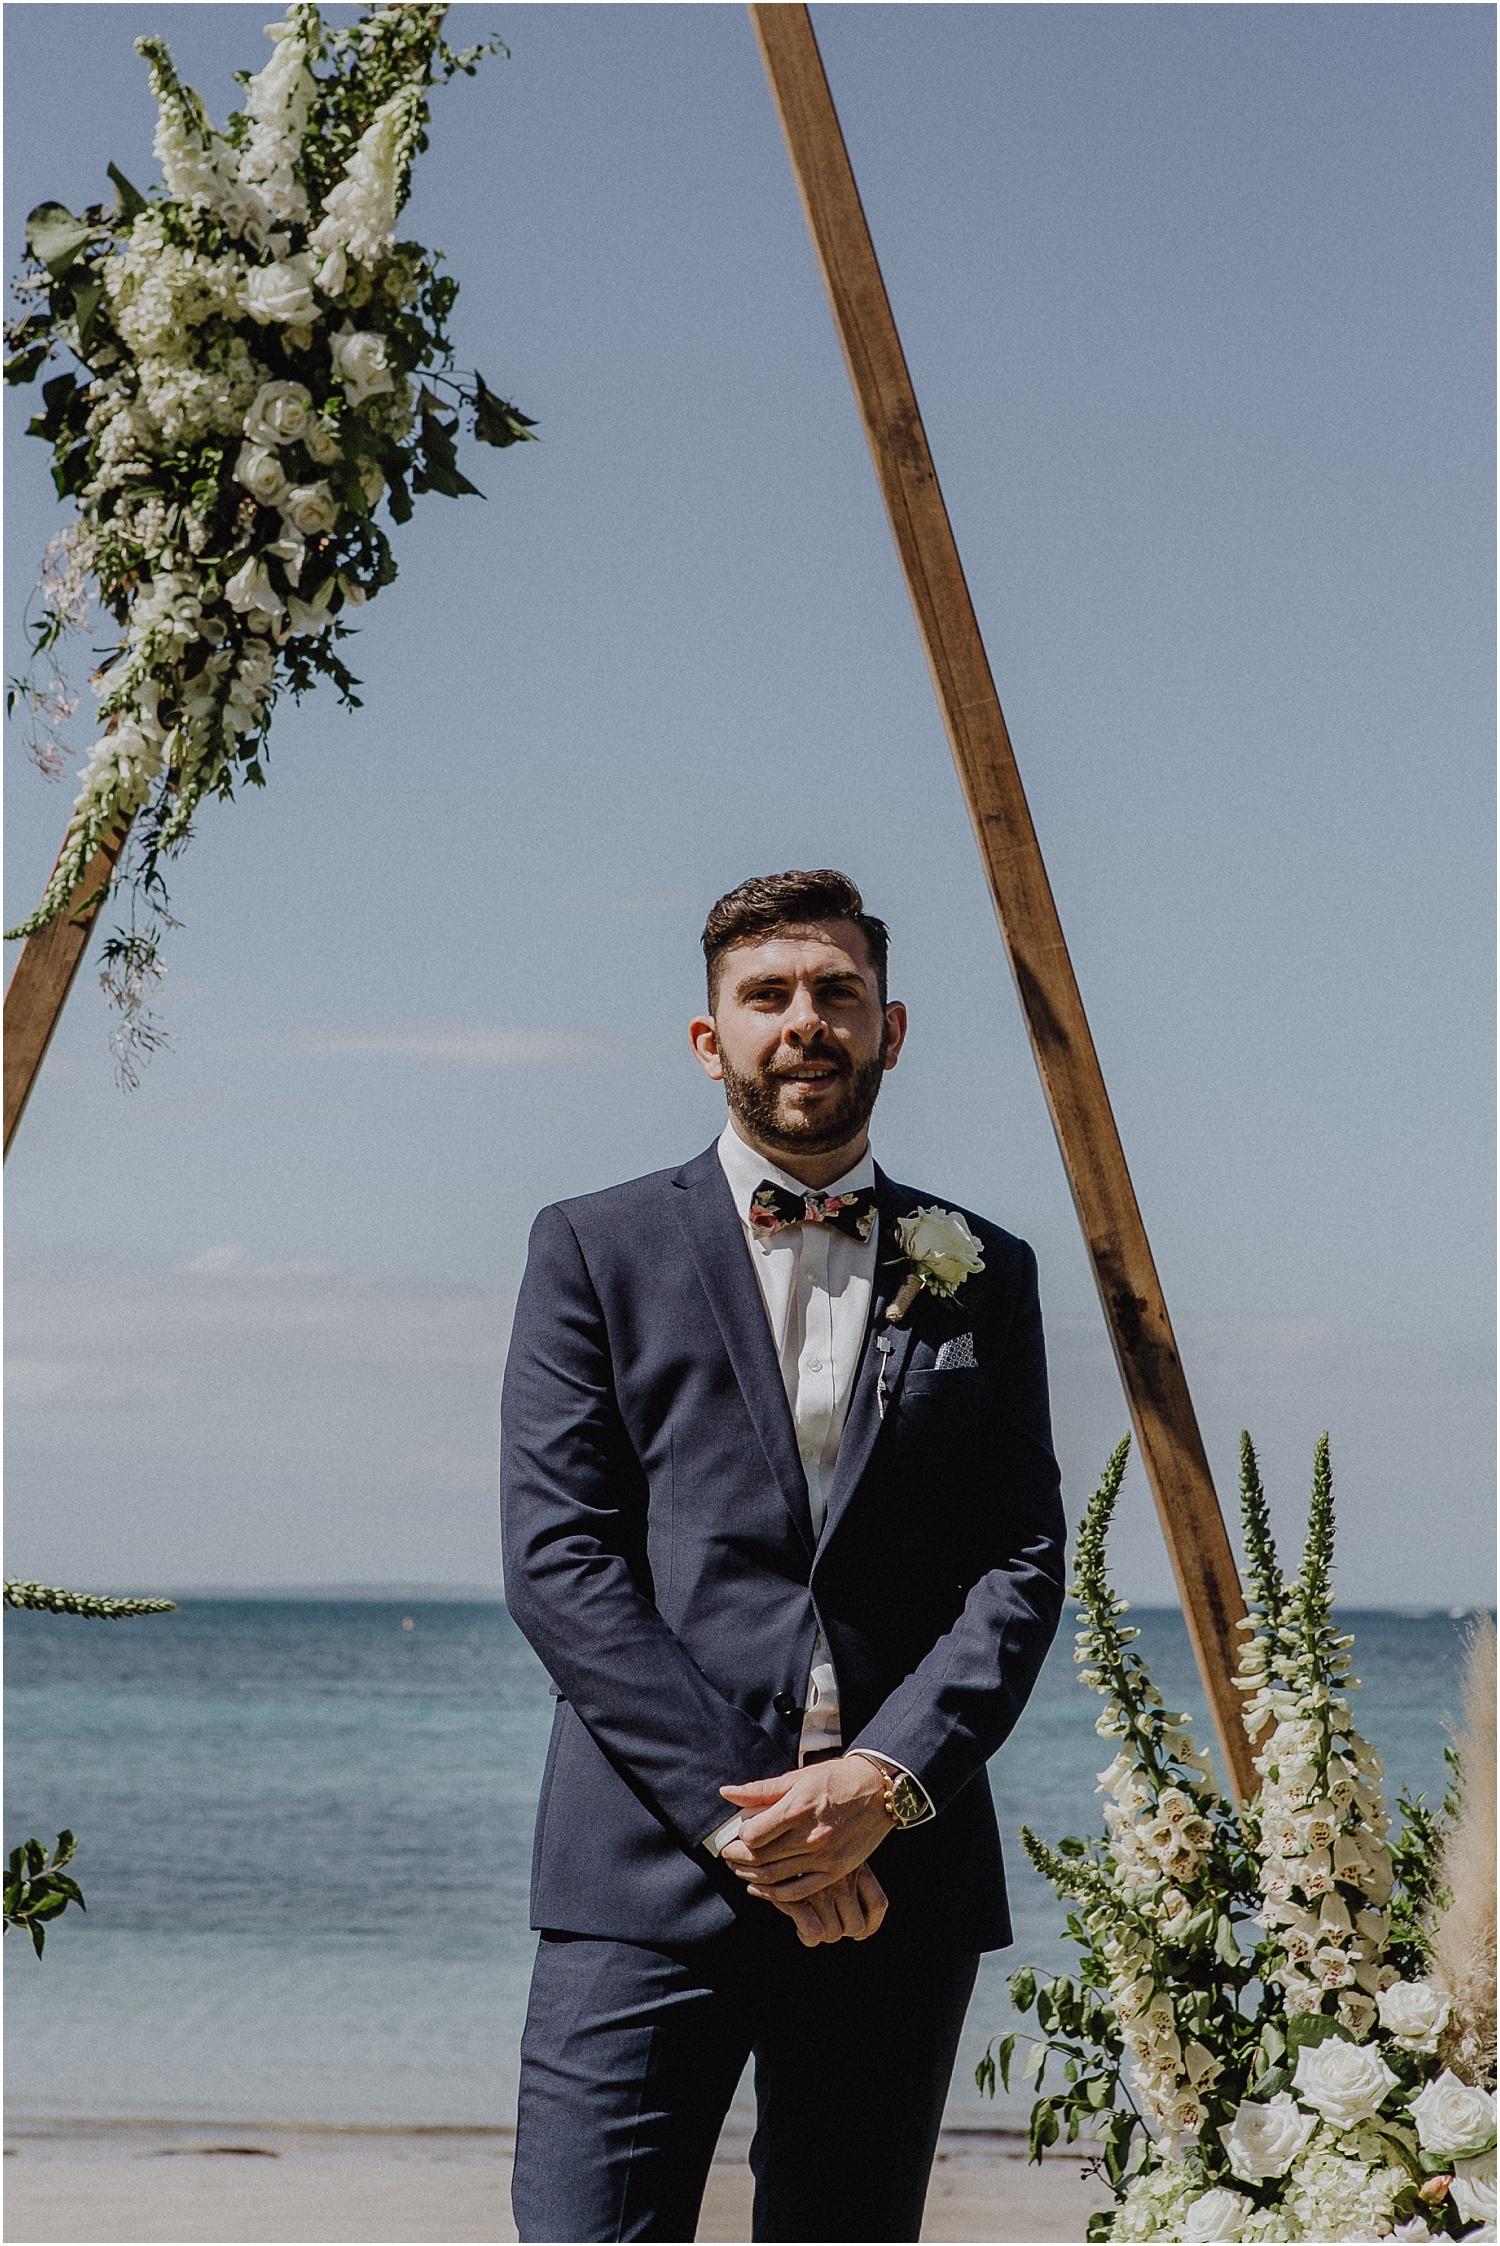 Nicolle and Damien's tipi wedding at the Flinders Yacht Club on the Mornington Peninsula._0061.jpg